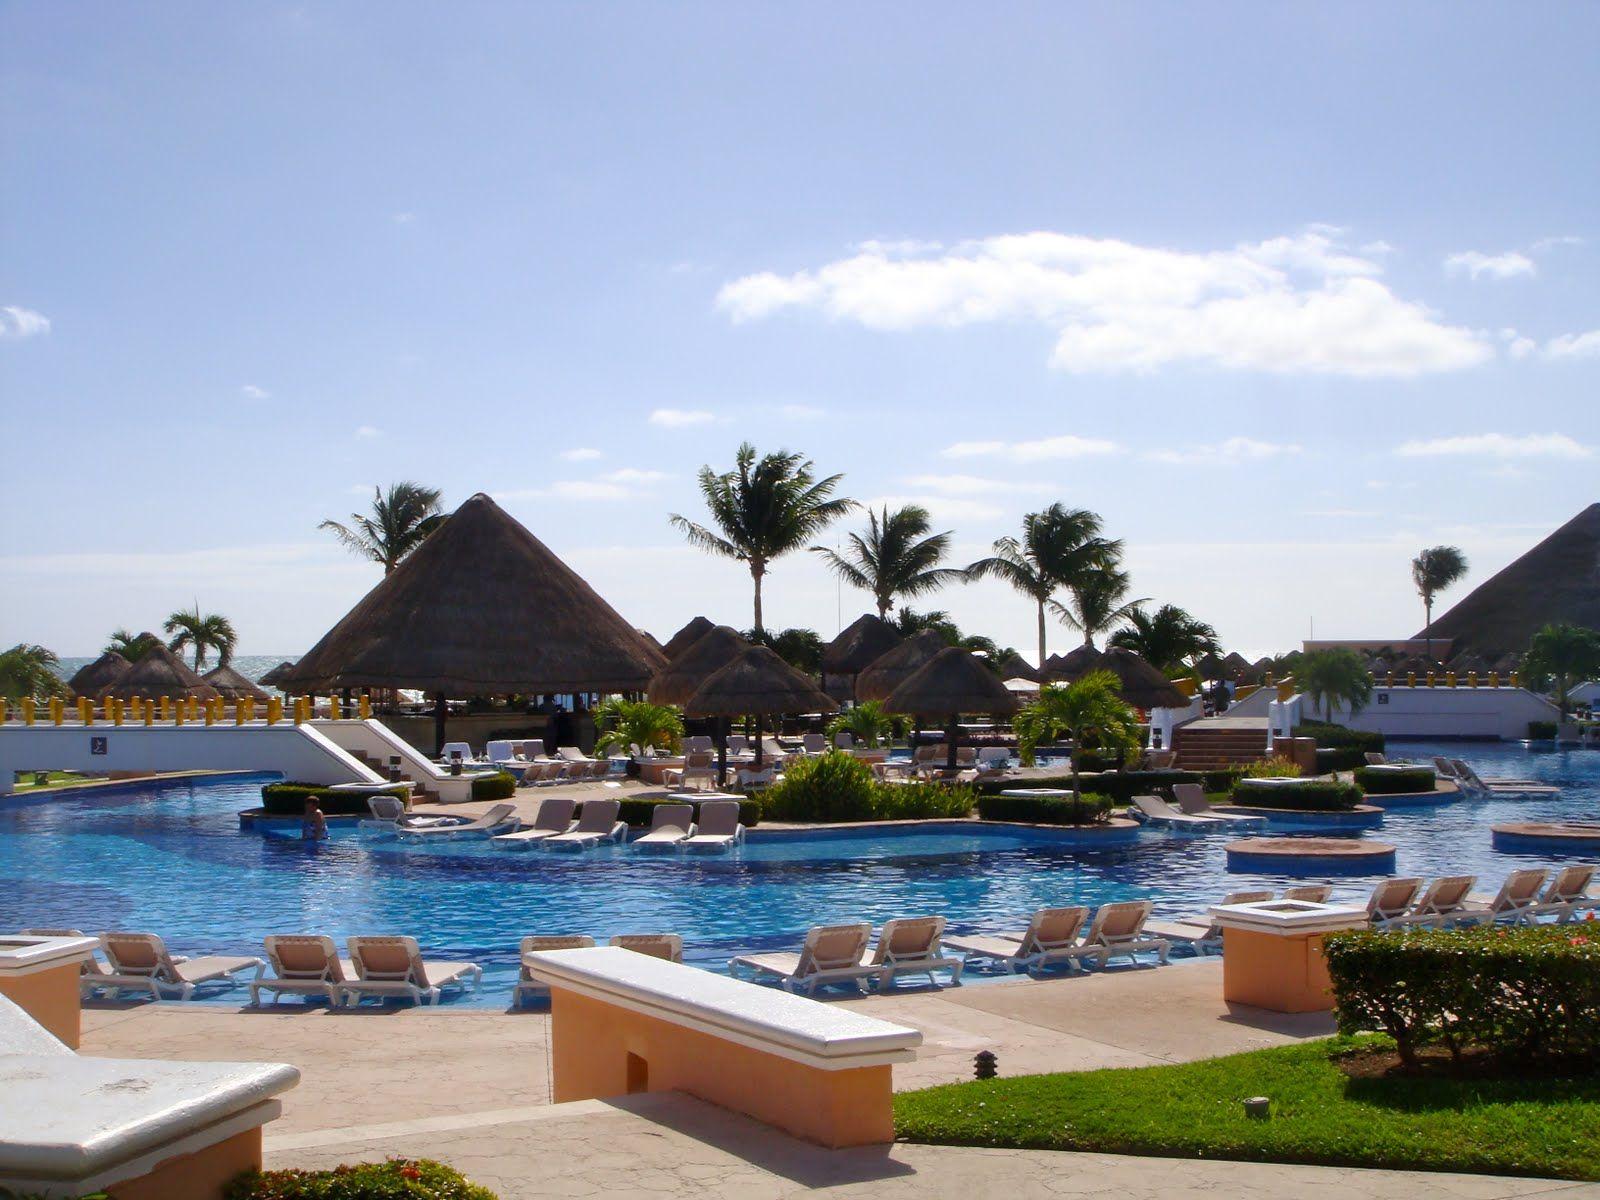 The resort of best so far fotos